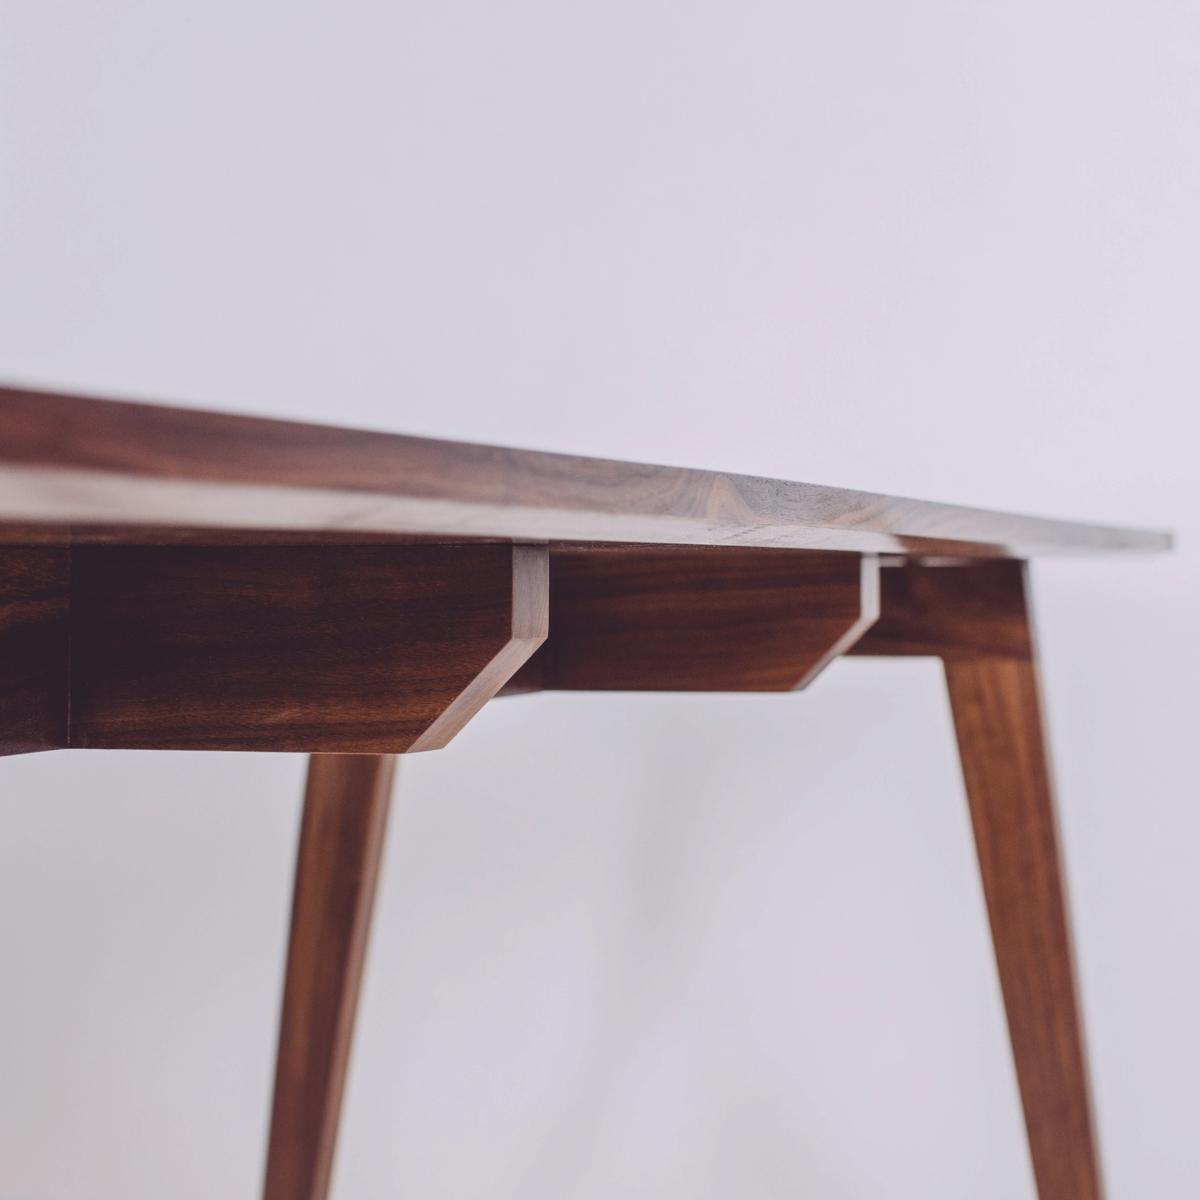 skana table_185600.jpg